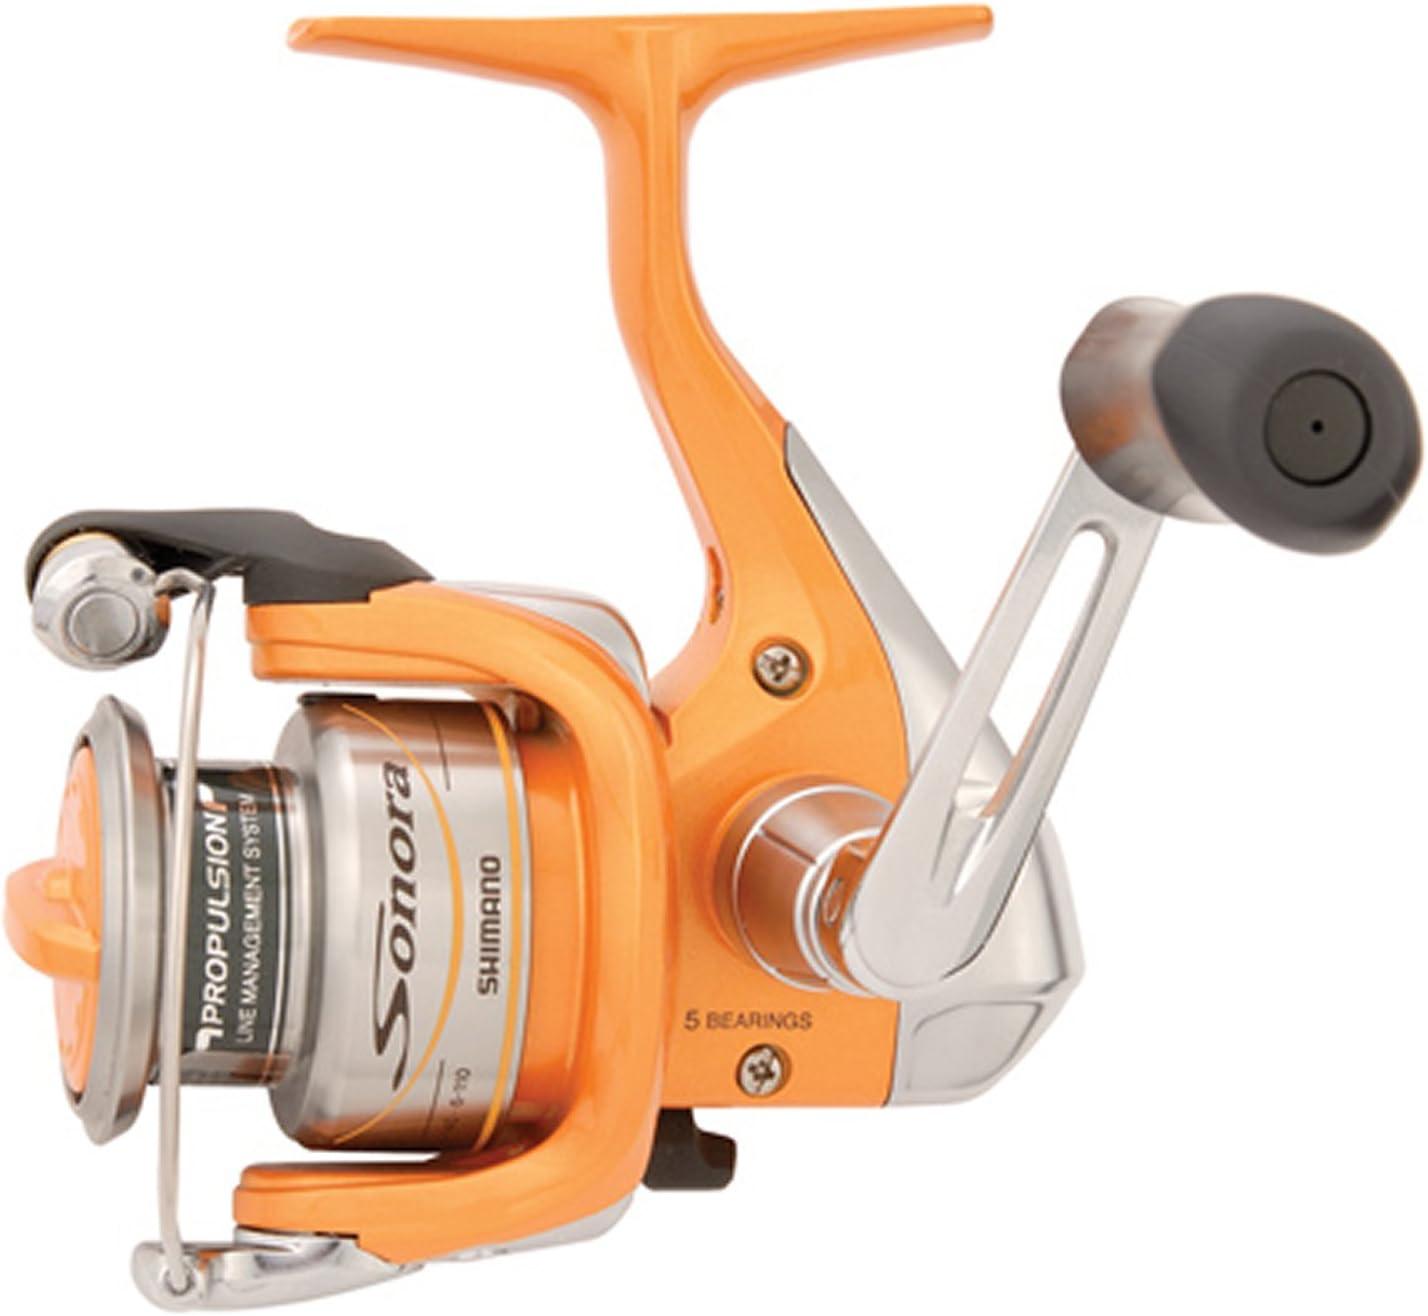 Shimano Sonora FB Spinning Reel 5.7 1 Medium Heavy, 10 Pounds 200 Yards